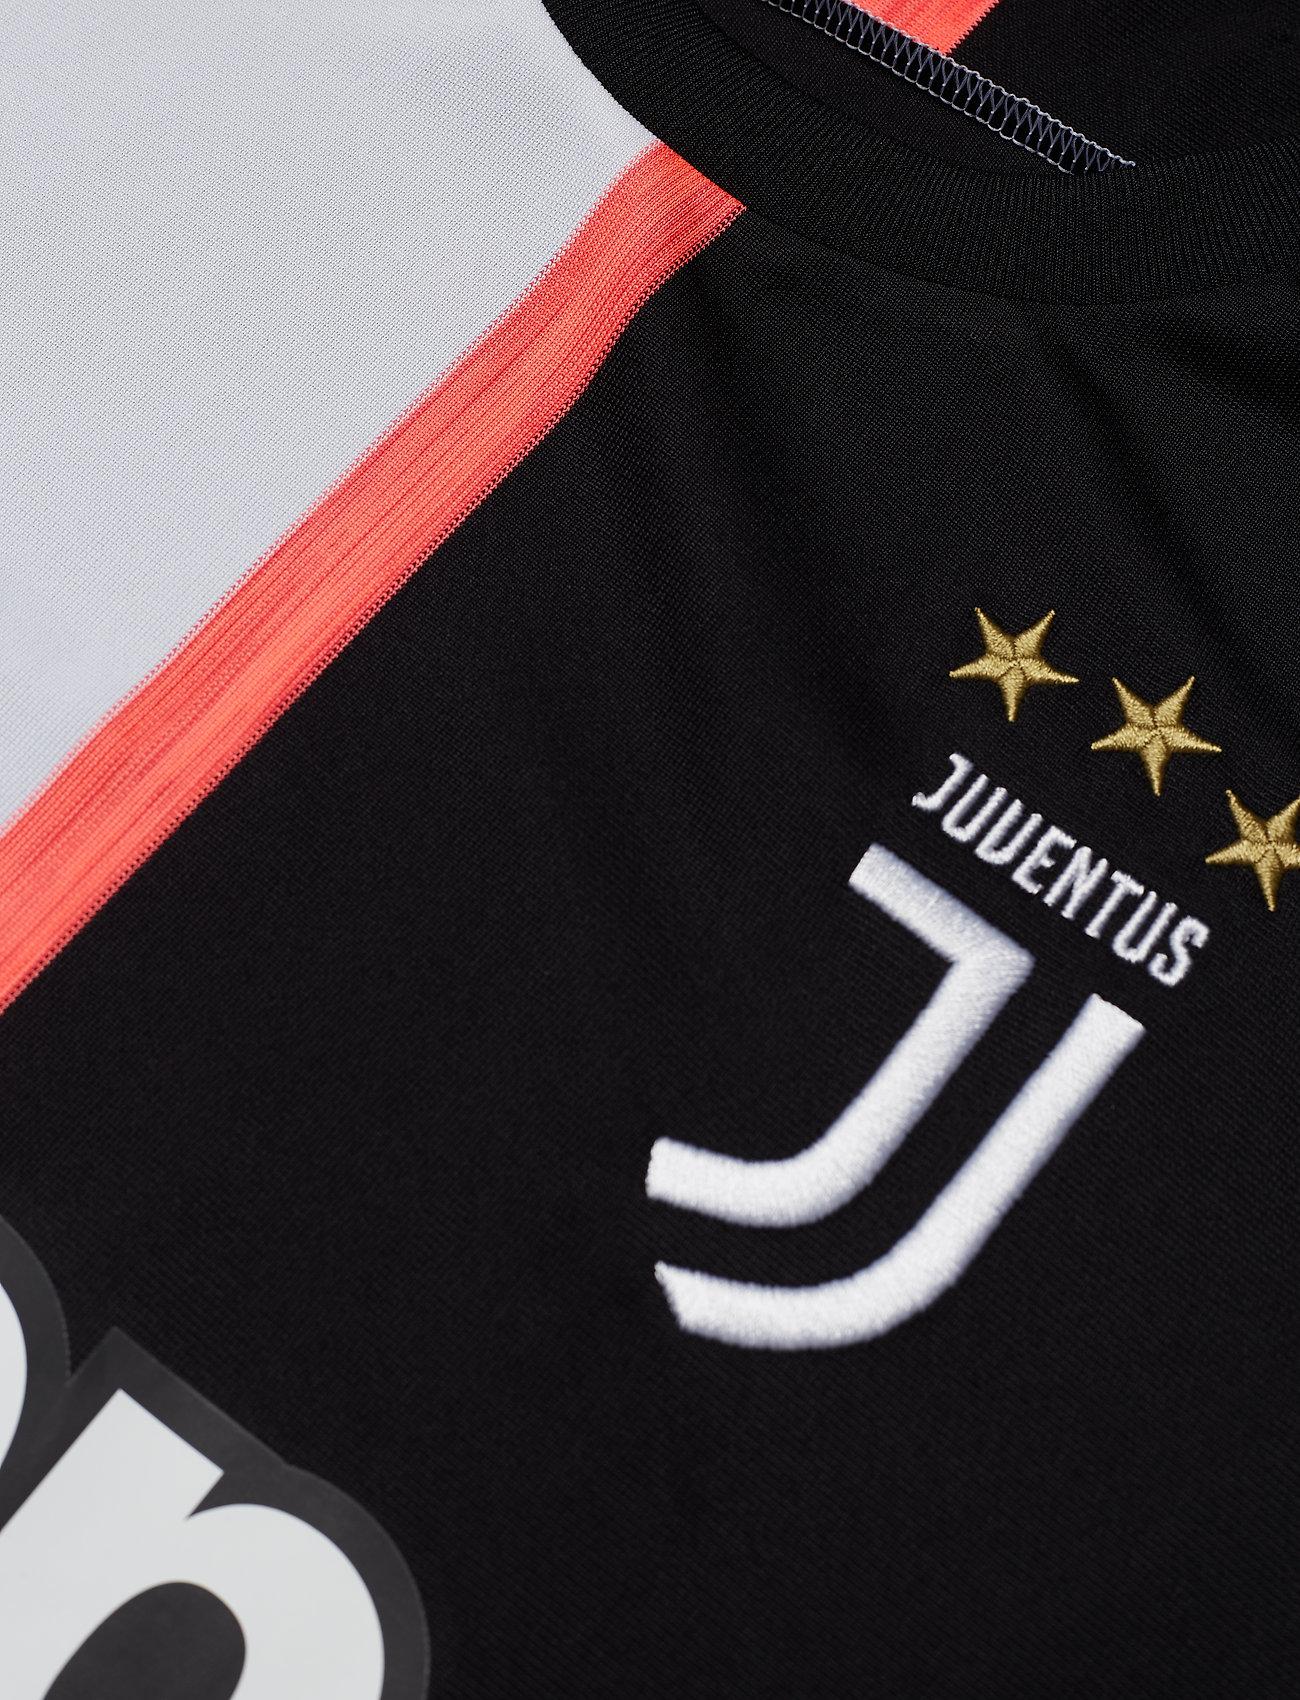 Juve H Jsy (Black/white) (419.40 kr) - adidas Performance gYDw0T62